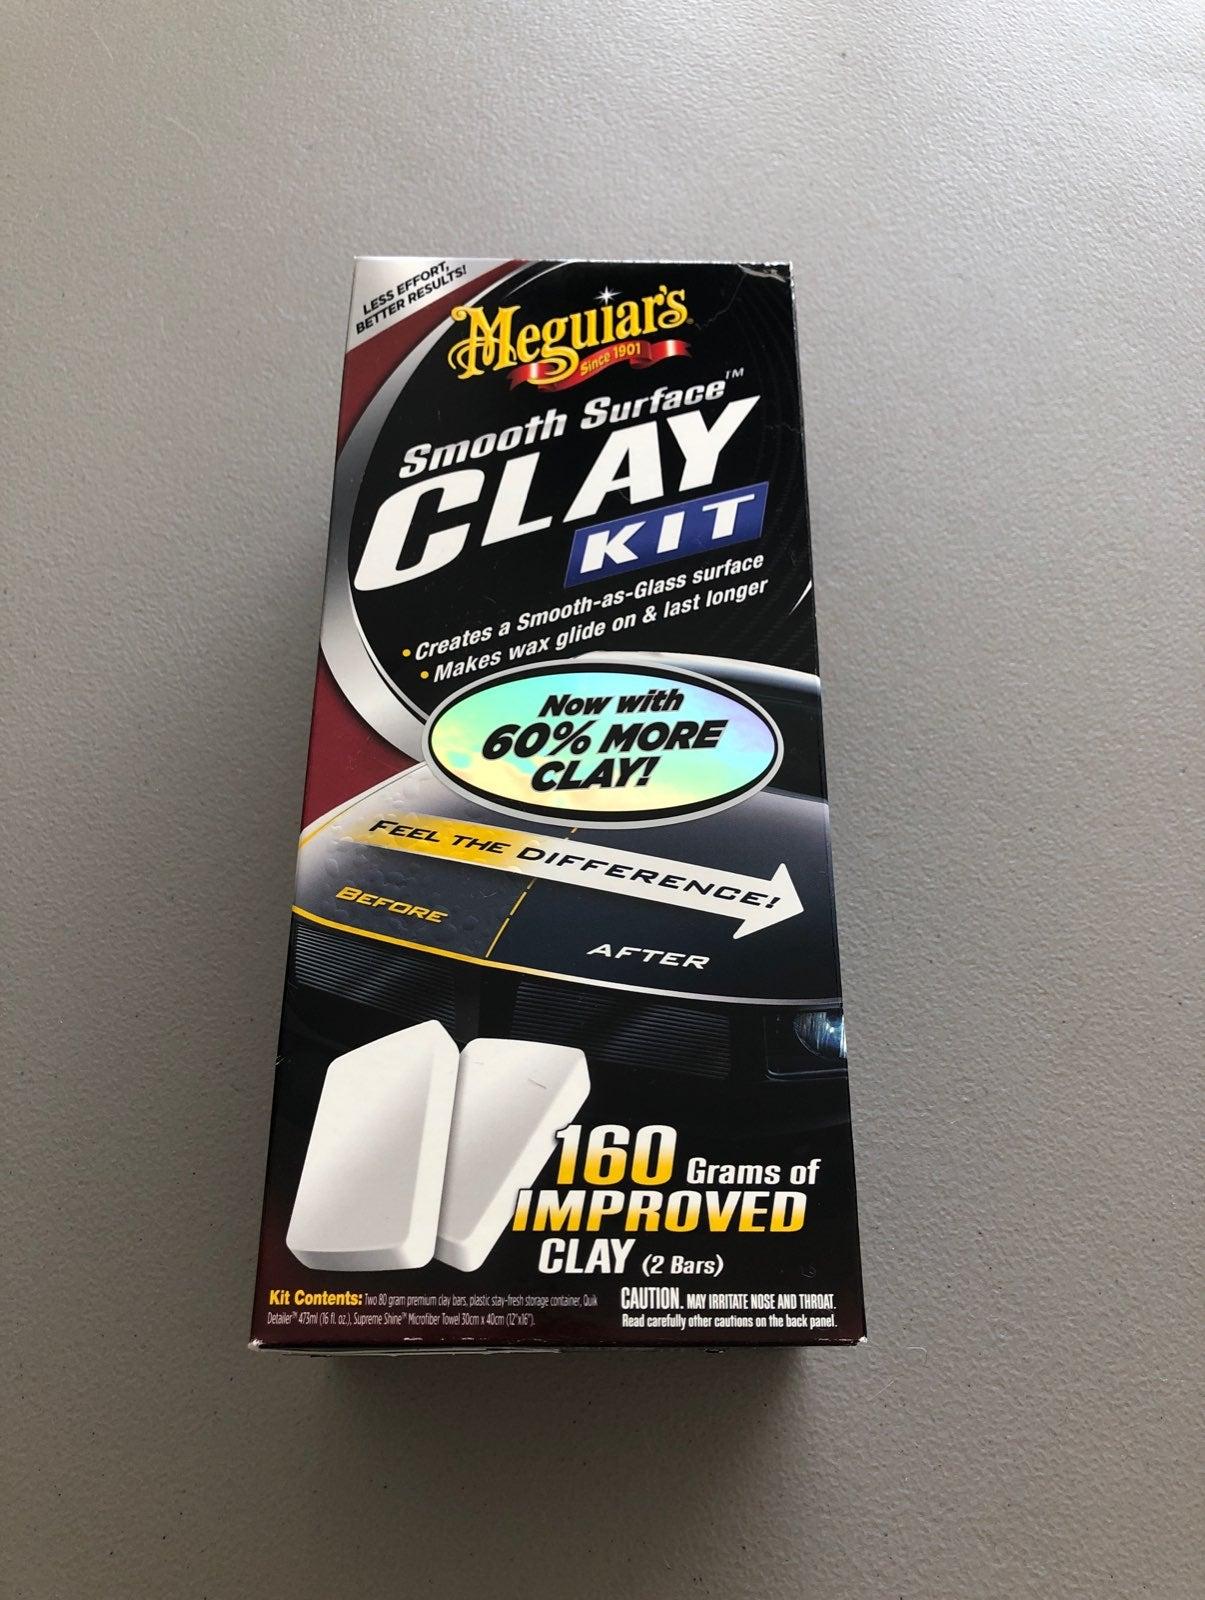 Meguiars clay kit